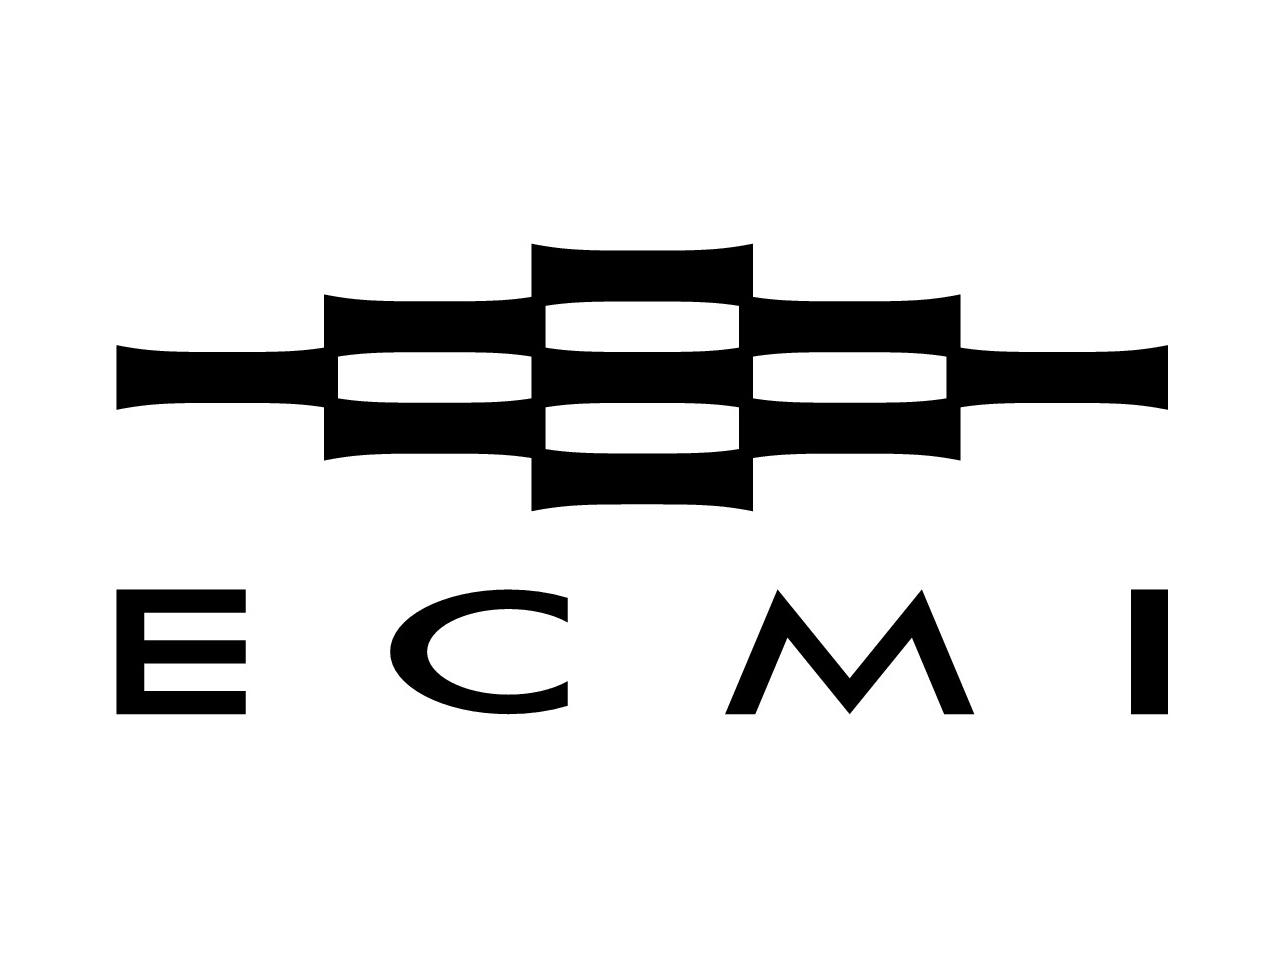 Участие кафедры в European Summer School in Industrial Mathematics (ESSIM)